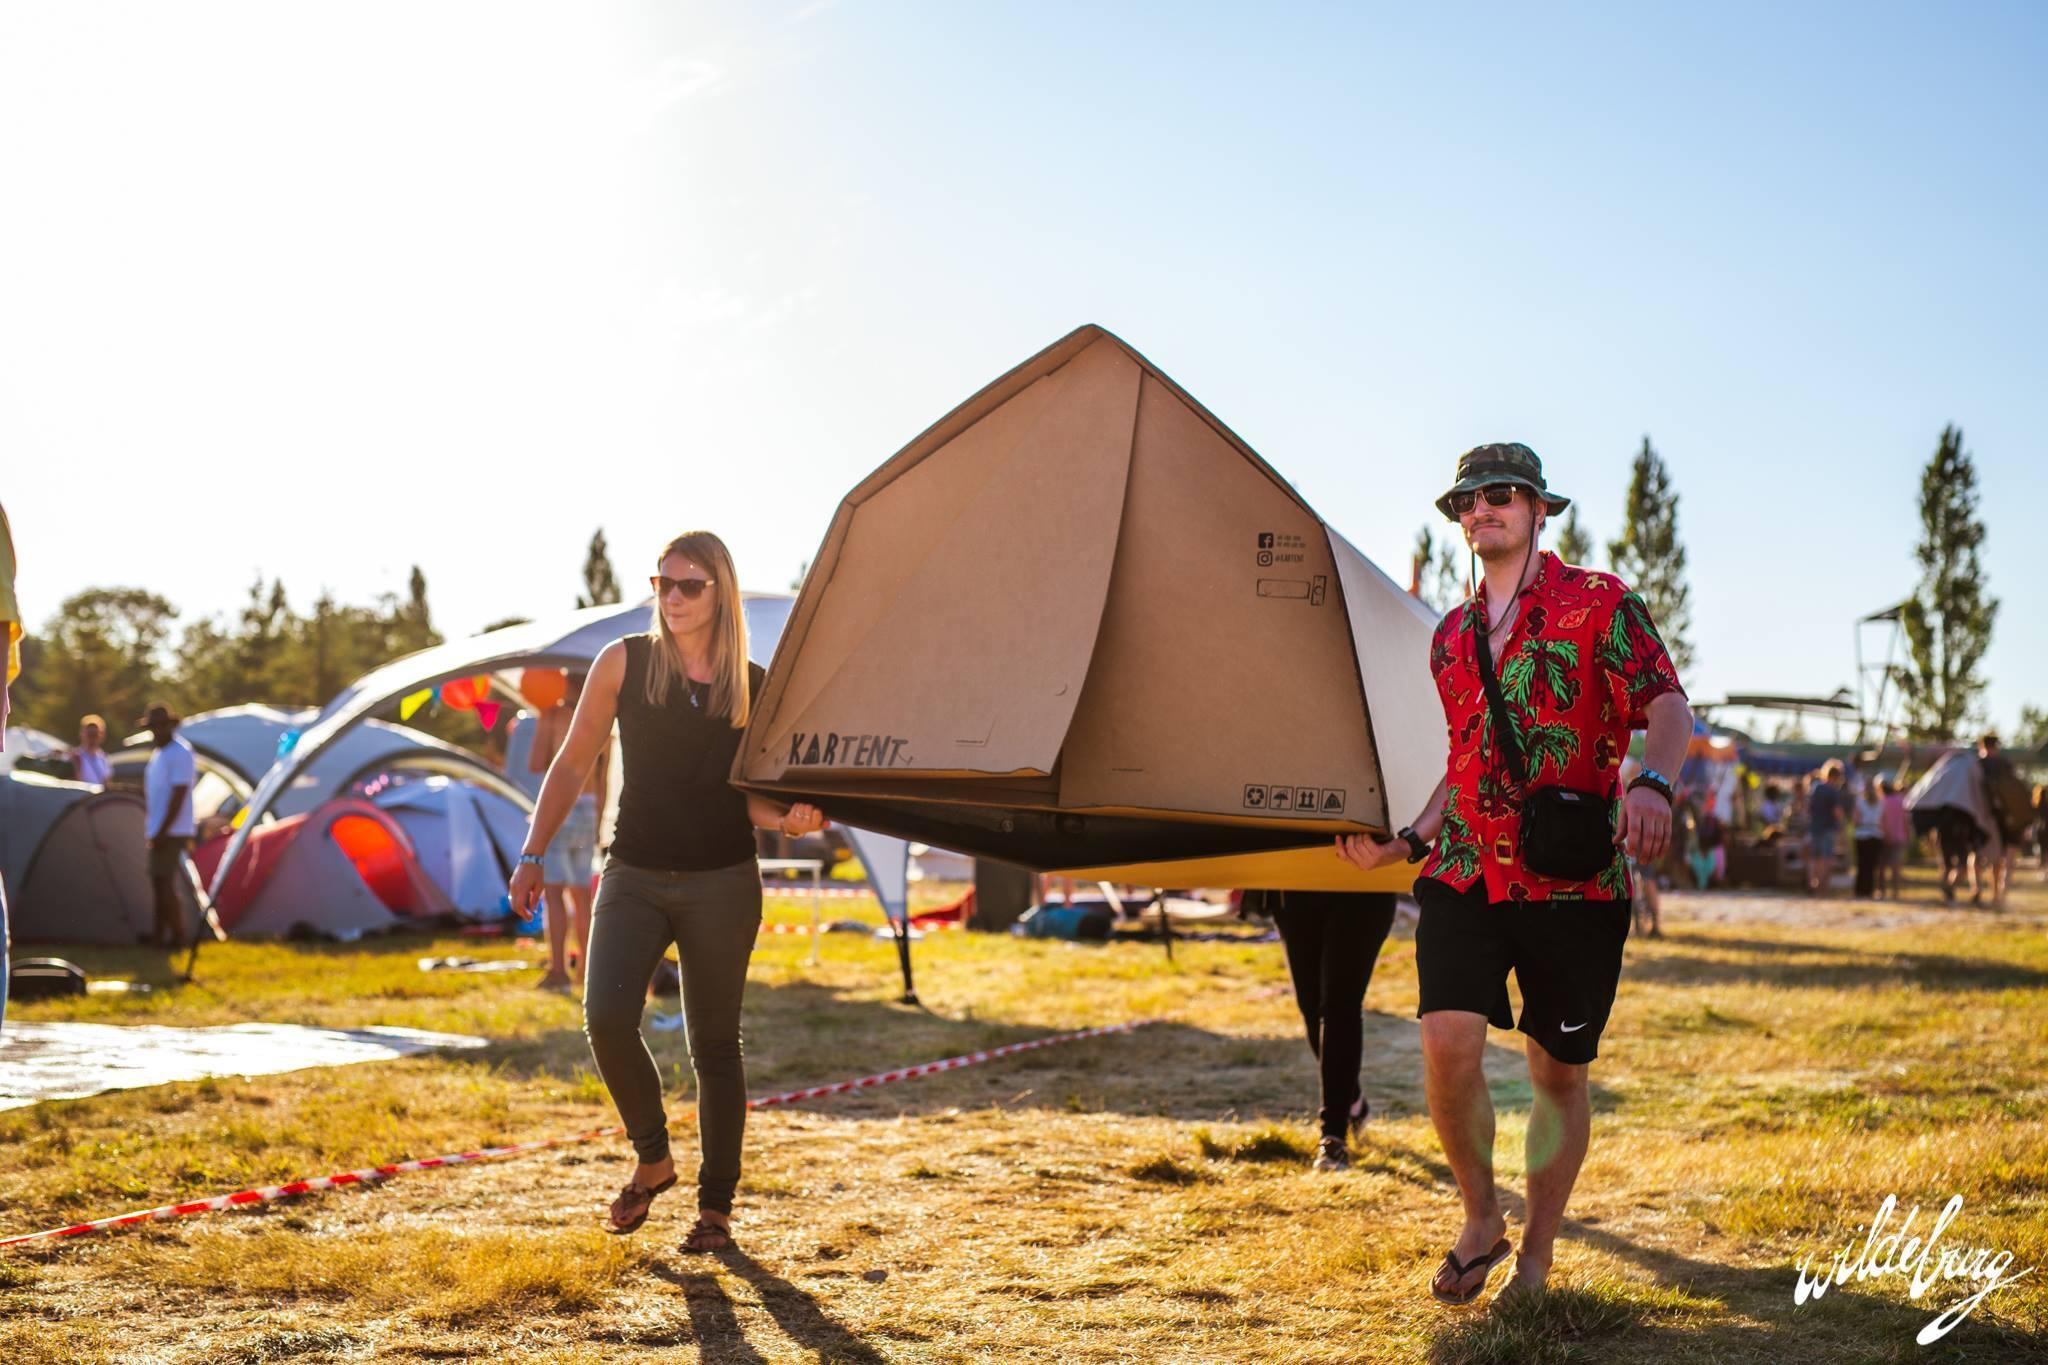 Kar Tent 5